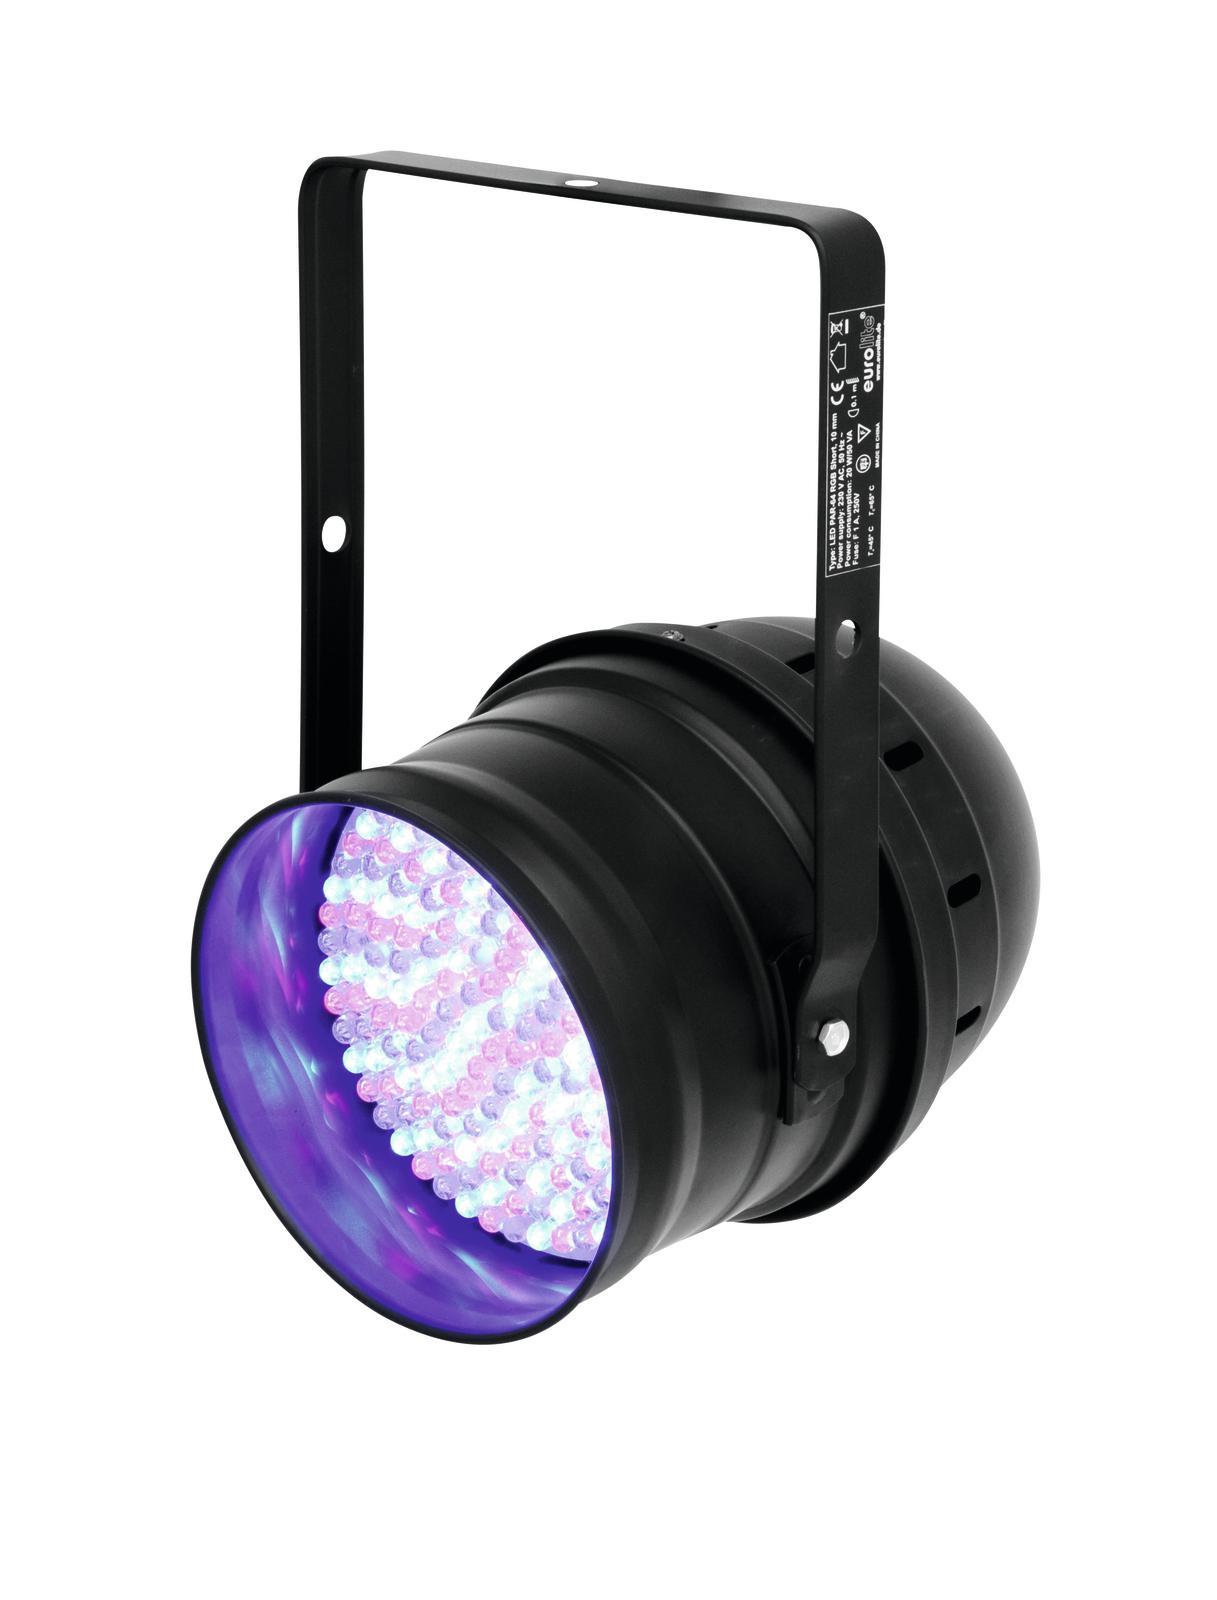 Effetto luce Faro par 64 a led Dmx 20 watt 183 led rgb Eurolite